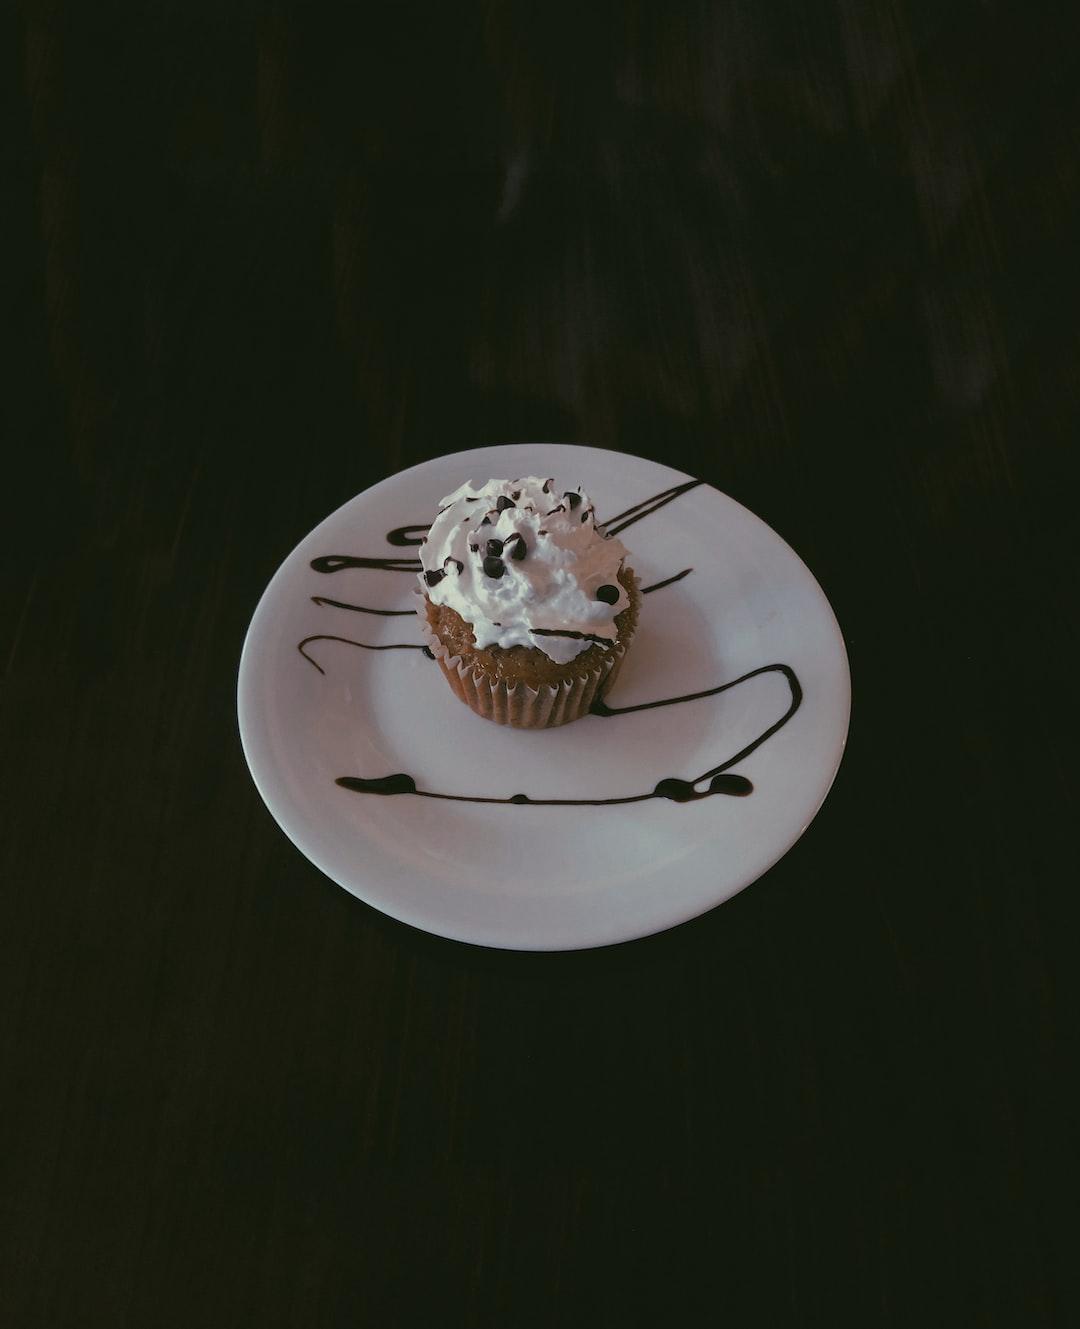 Banana cupcake in a quaint cafe.